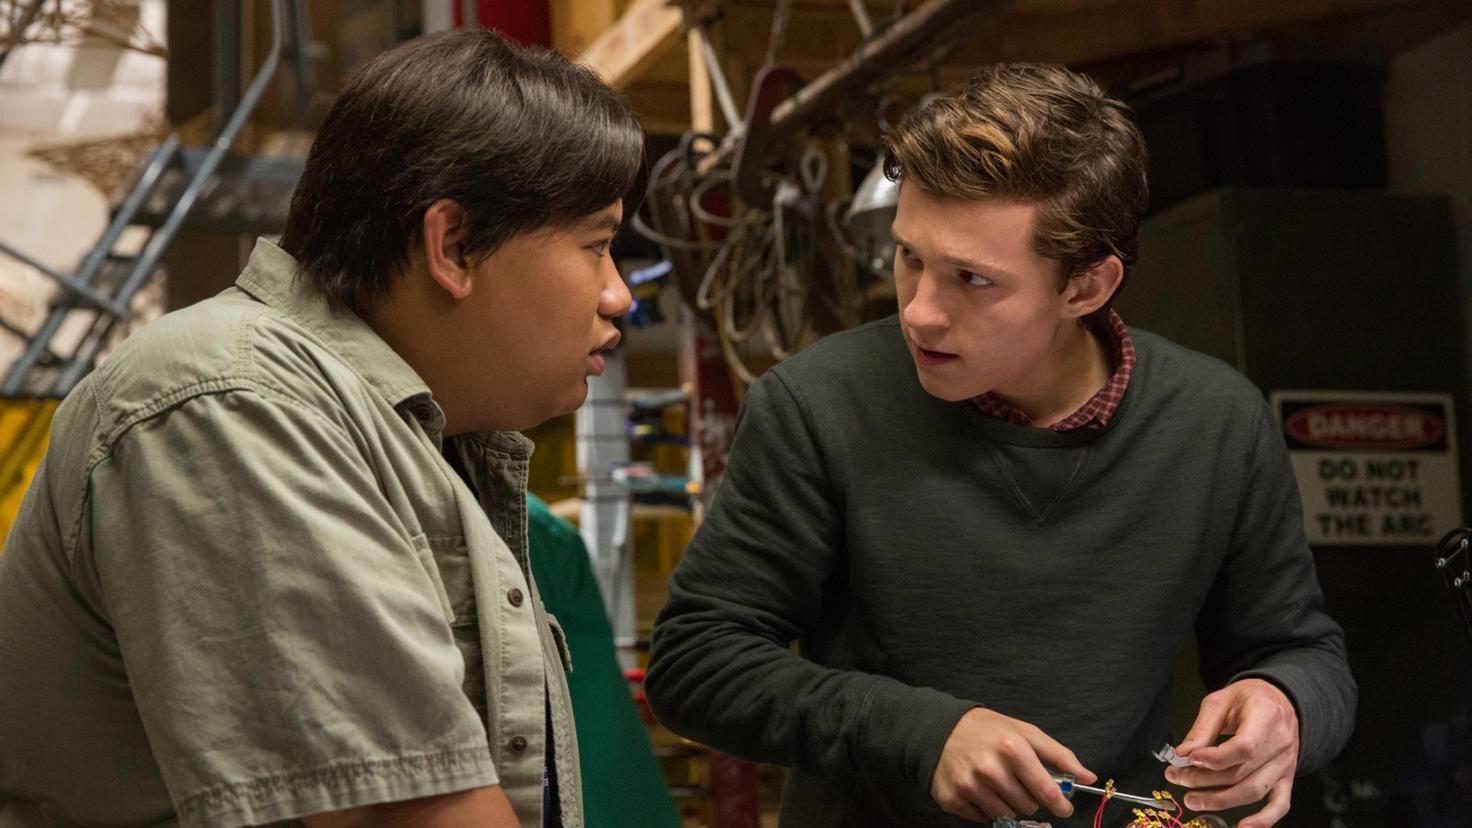 ... den besten Kumpel von Peter Parker (Tom Holland).